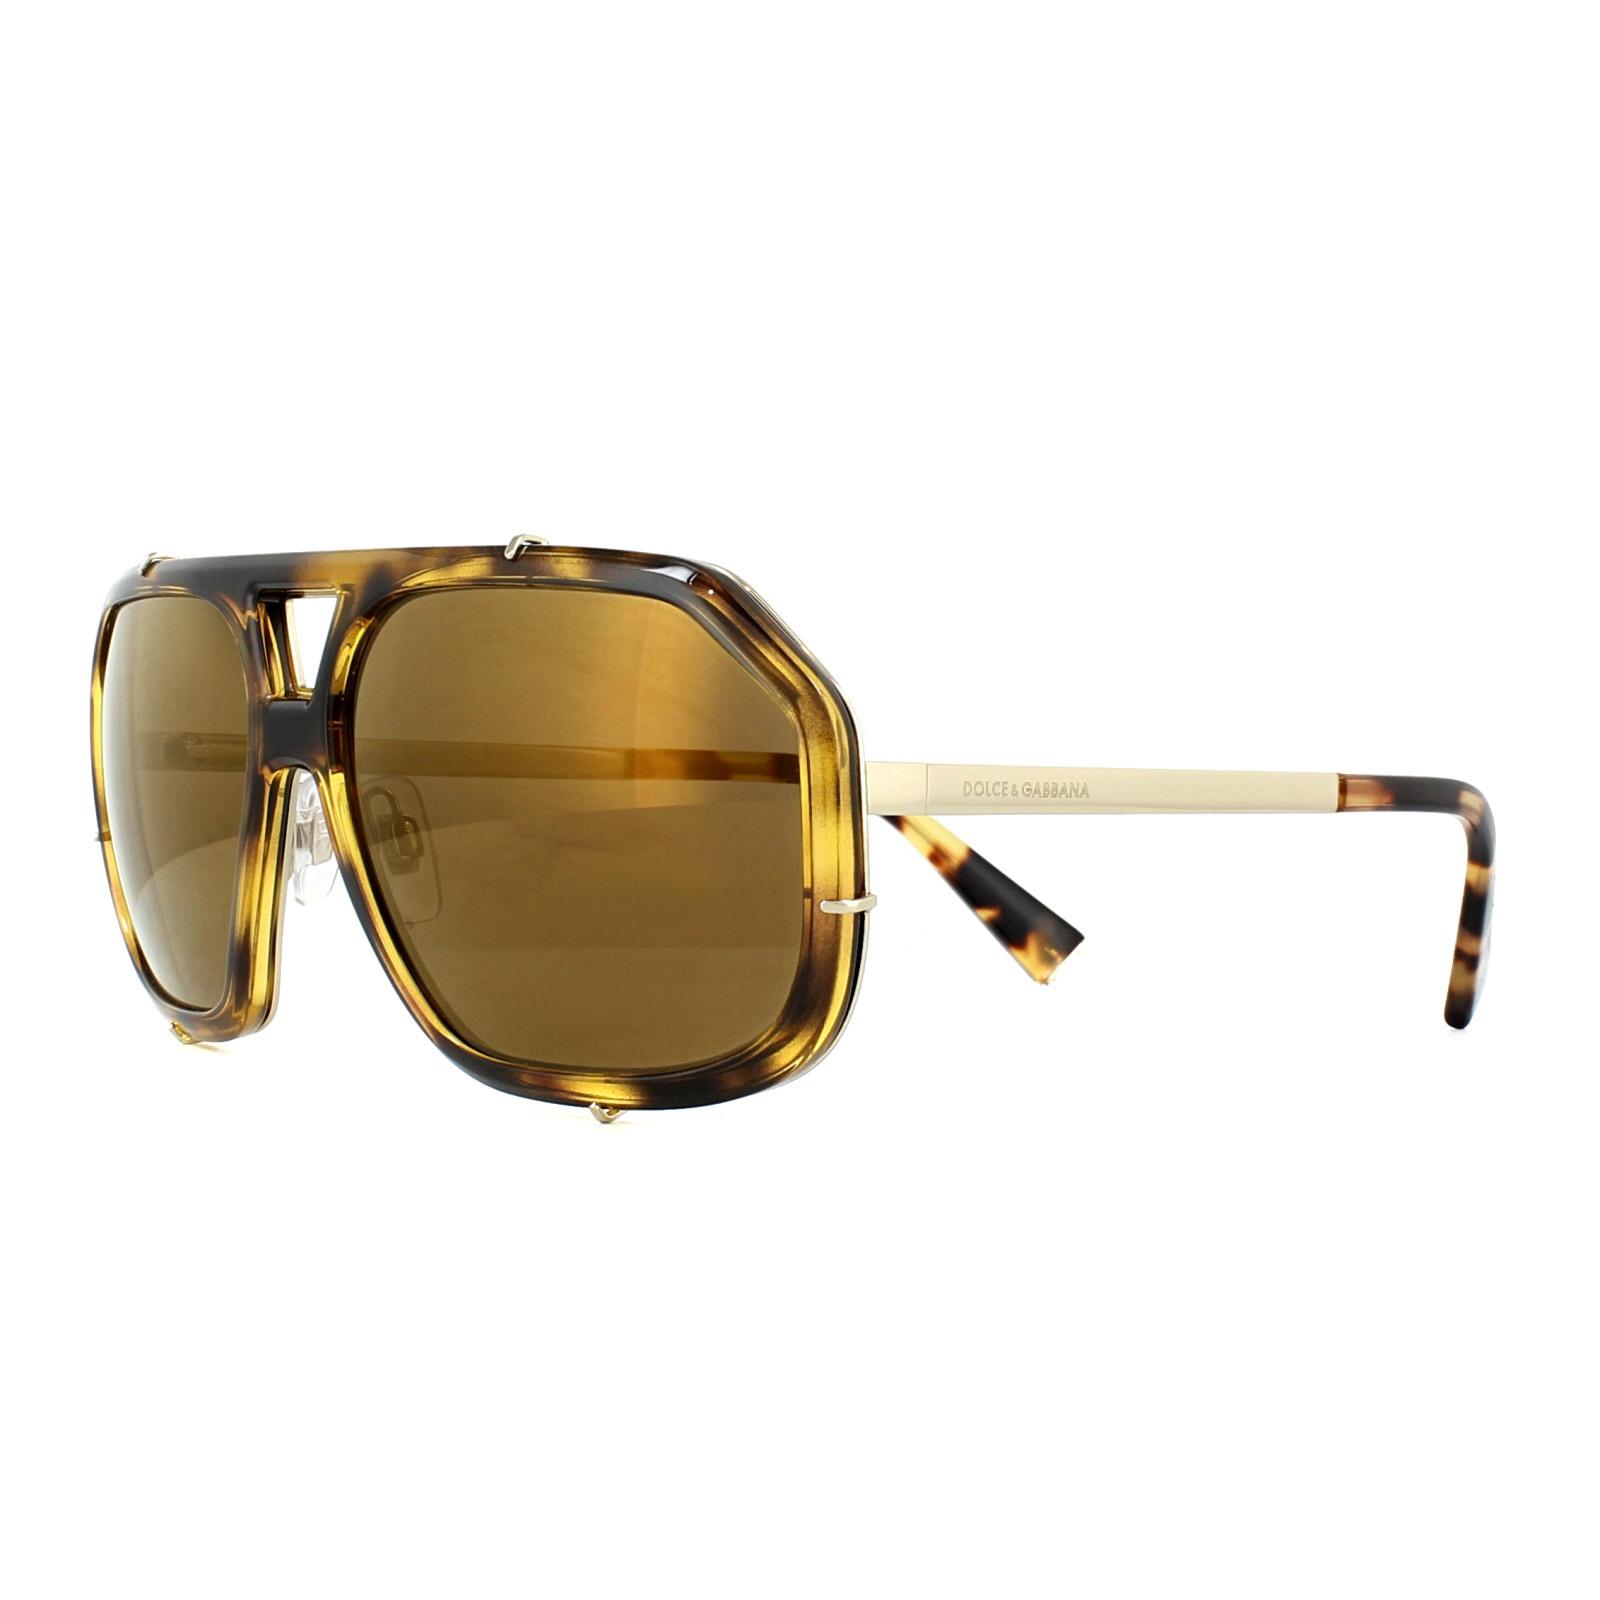 5cd108fa689d2 Sentinel Dolce   Gabbana Sunglasses 2167 488-F9 Cube Havana Brown Mirror  Bronze